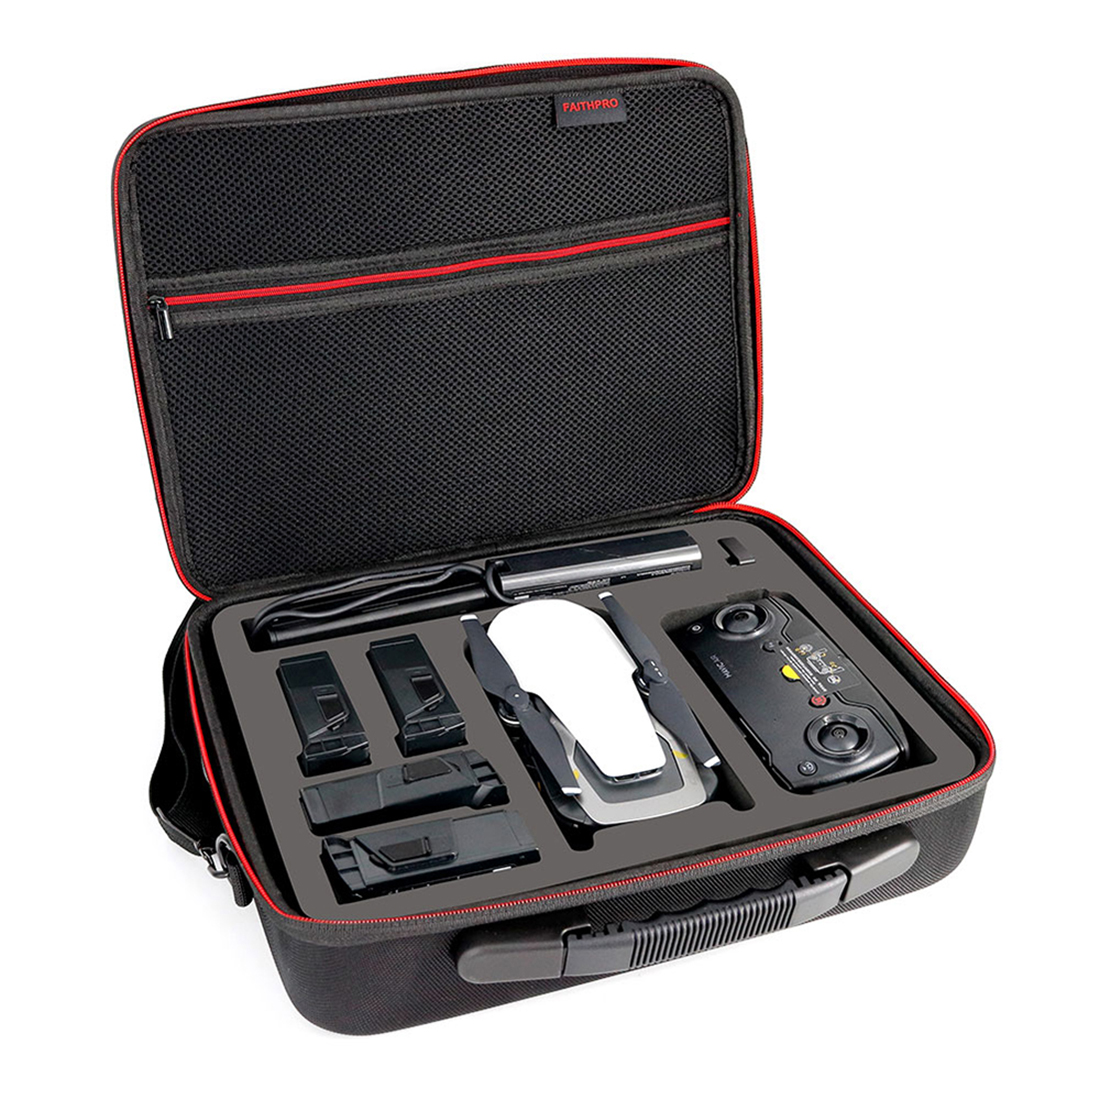 HOBBYINRC Handbag Portable Storage Case for DJI Mavic Air EVA 5 Battery Cell Storage Organizer Bag